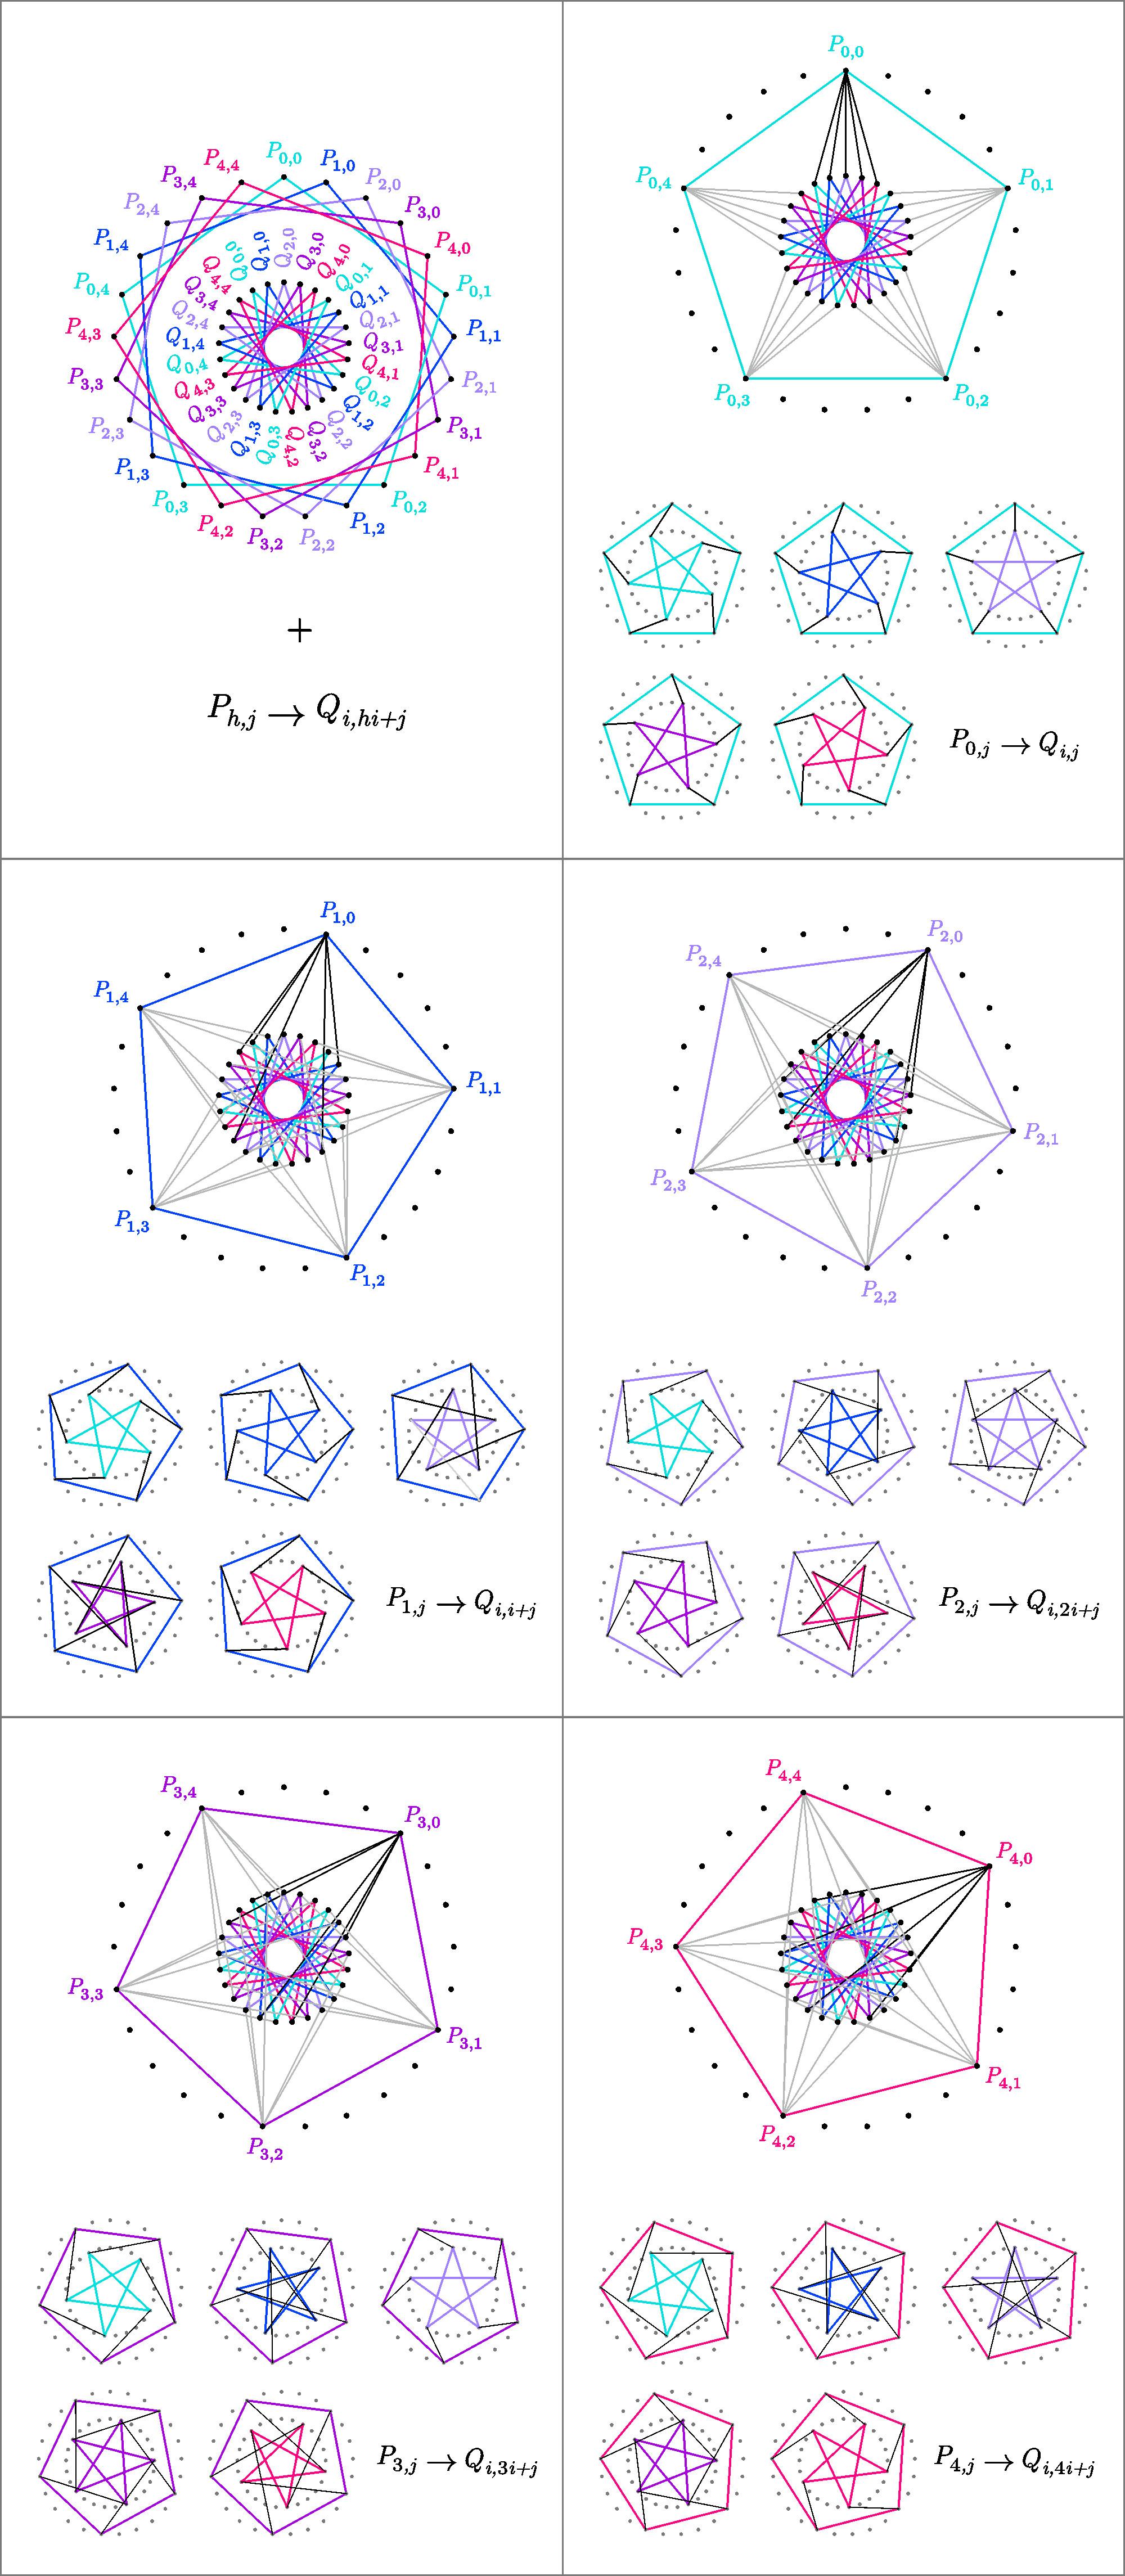 hoffman singleton graph construction and petersen subgraphs felix de la fuente